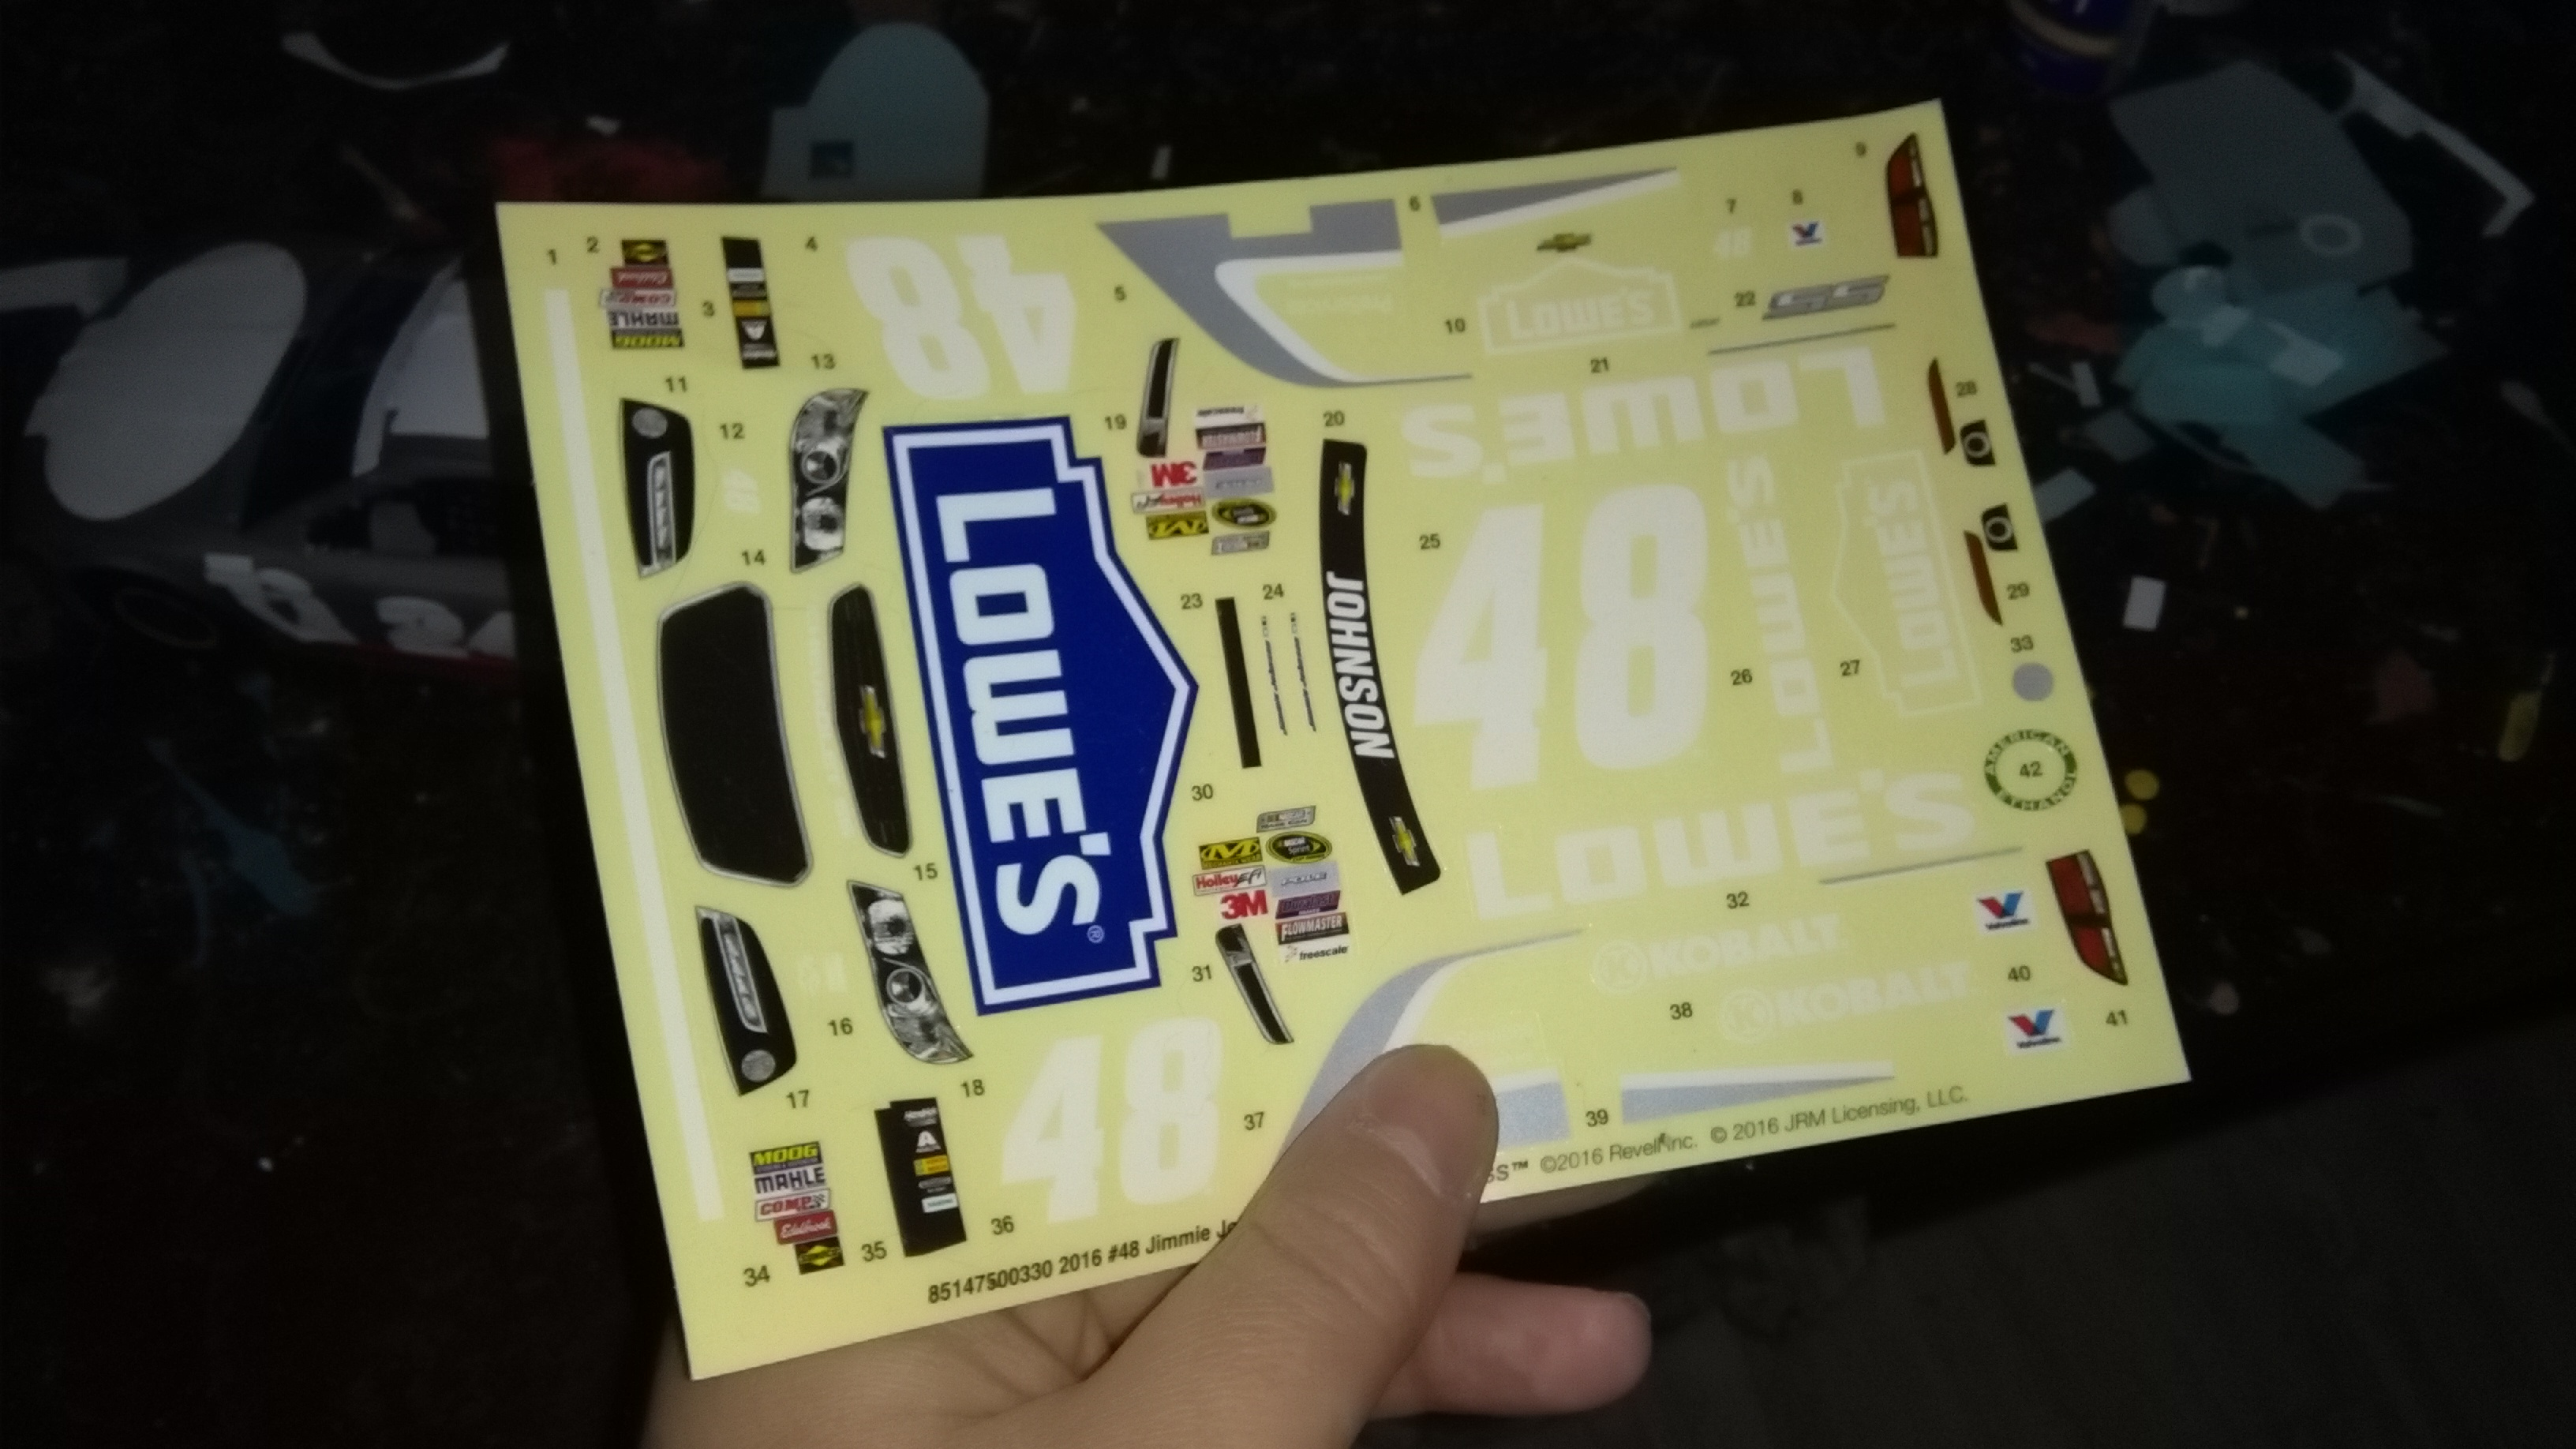 Chevrolet SS 2015 #24 Jeff Gordon 3M 780204IMG20170319184104